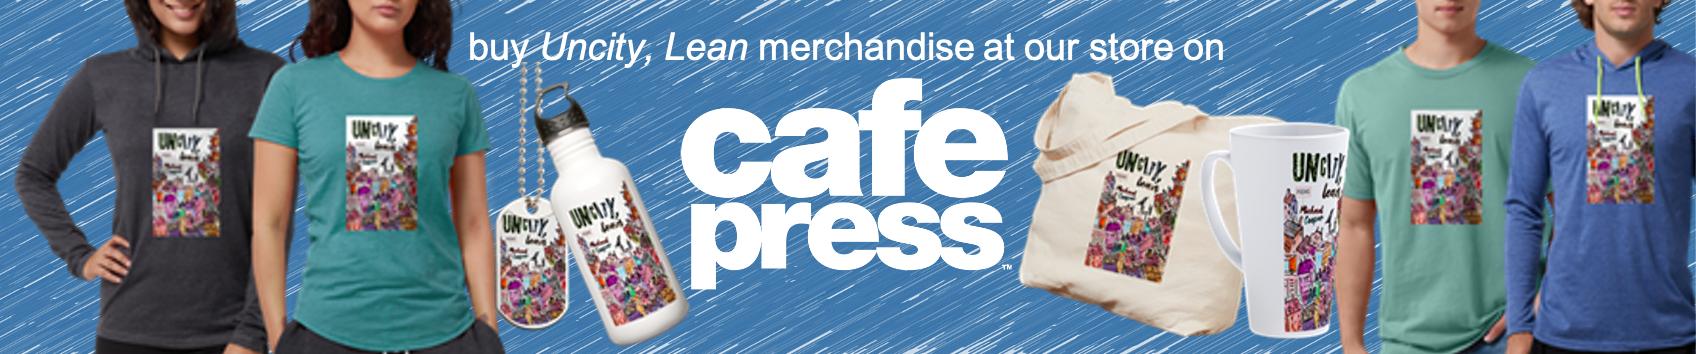 Buy Uncity, Lean merchandise at Cafe Press